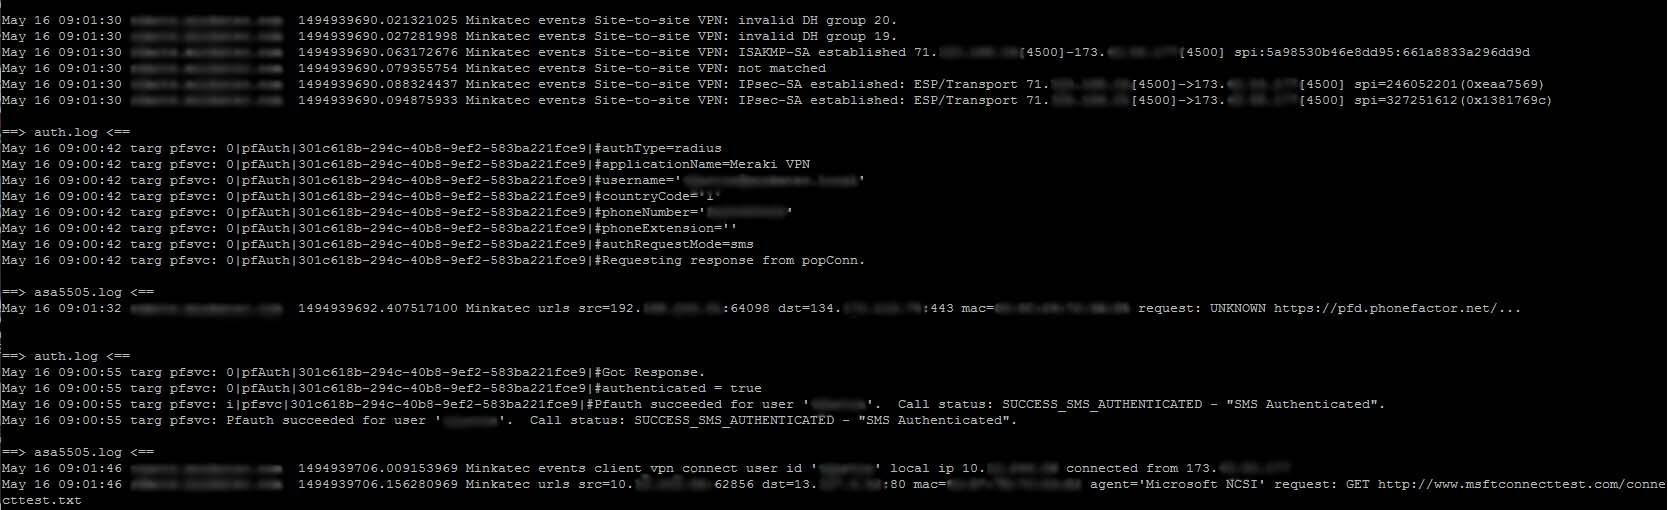 Azure Multi-Factor Authentication with Meraki Security